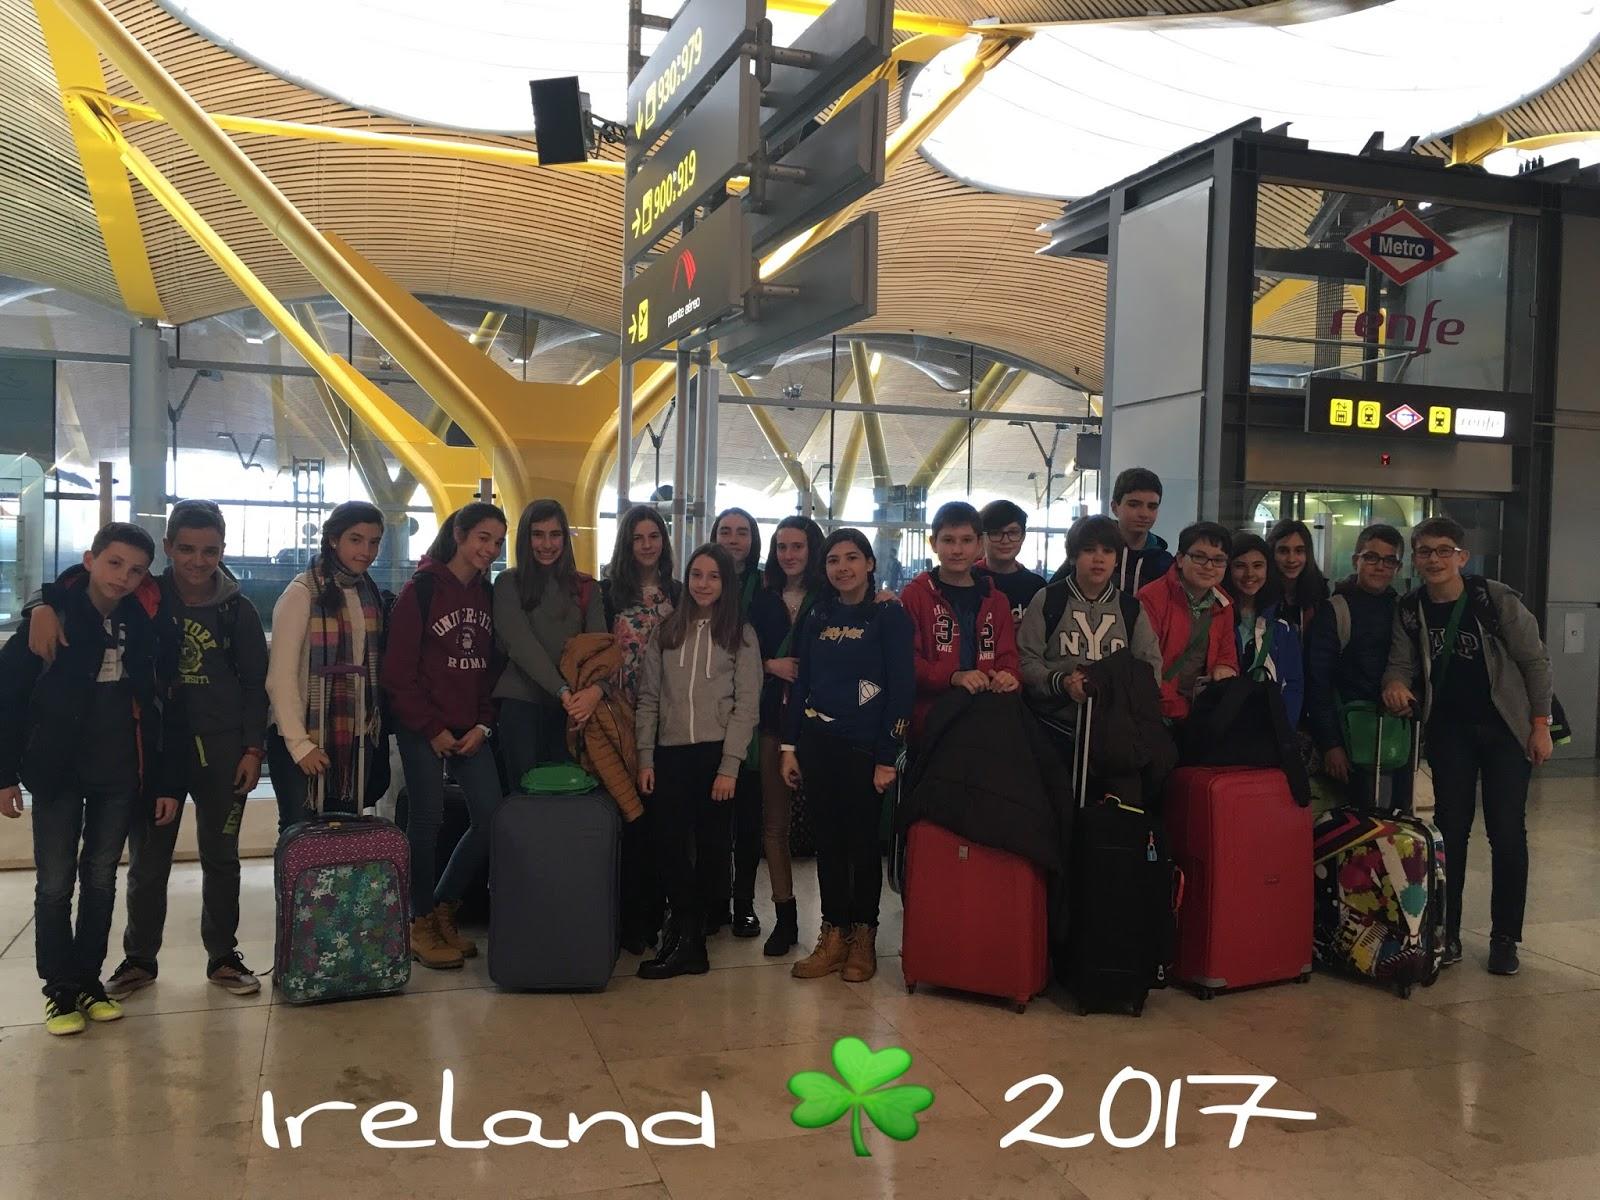 Agustinas Valladolid - 2017 - ESO 1 2 - Irlanda 1